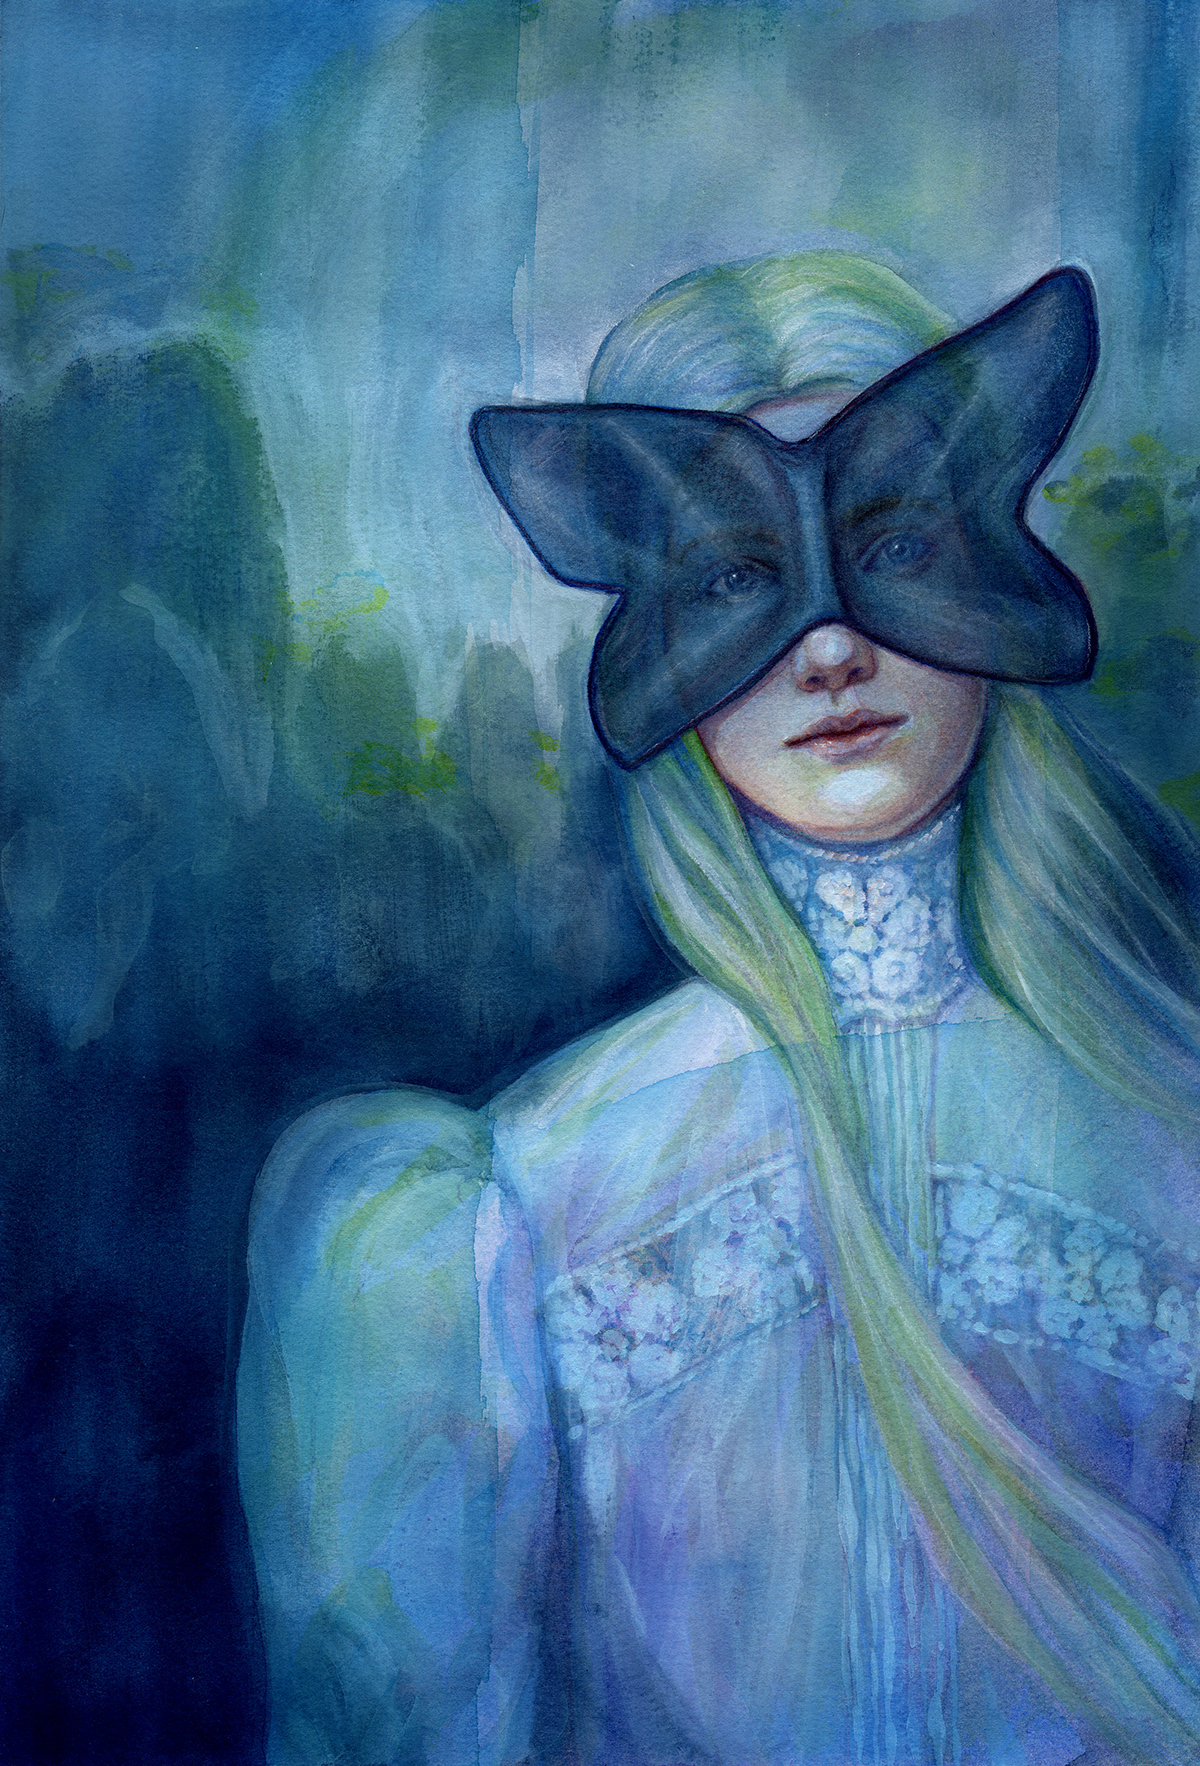 "Miranda - Watercolour - 11.69 x 16.55'"" - $495"